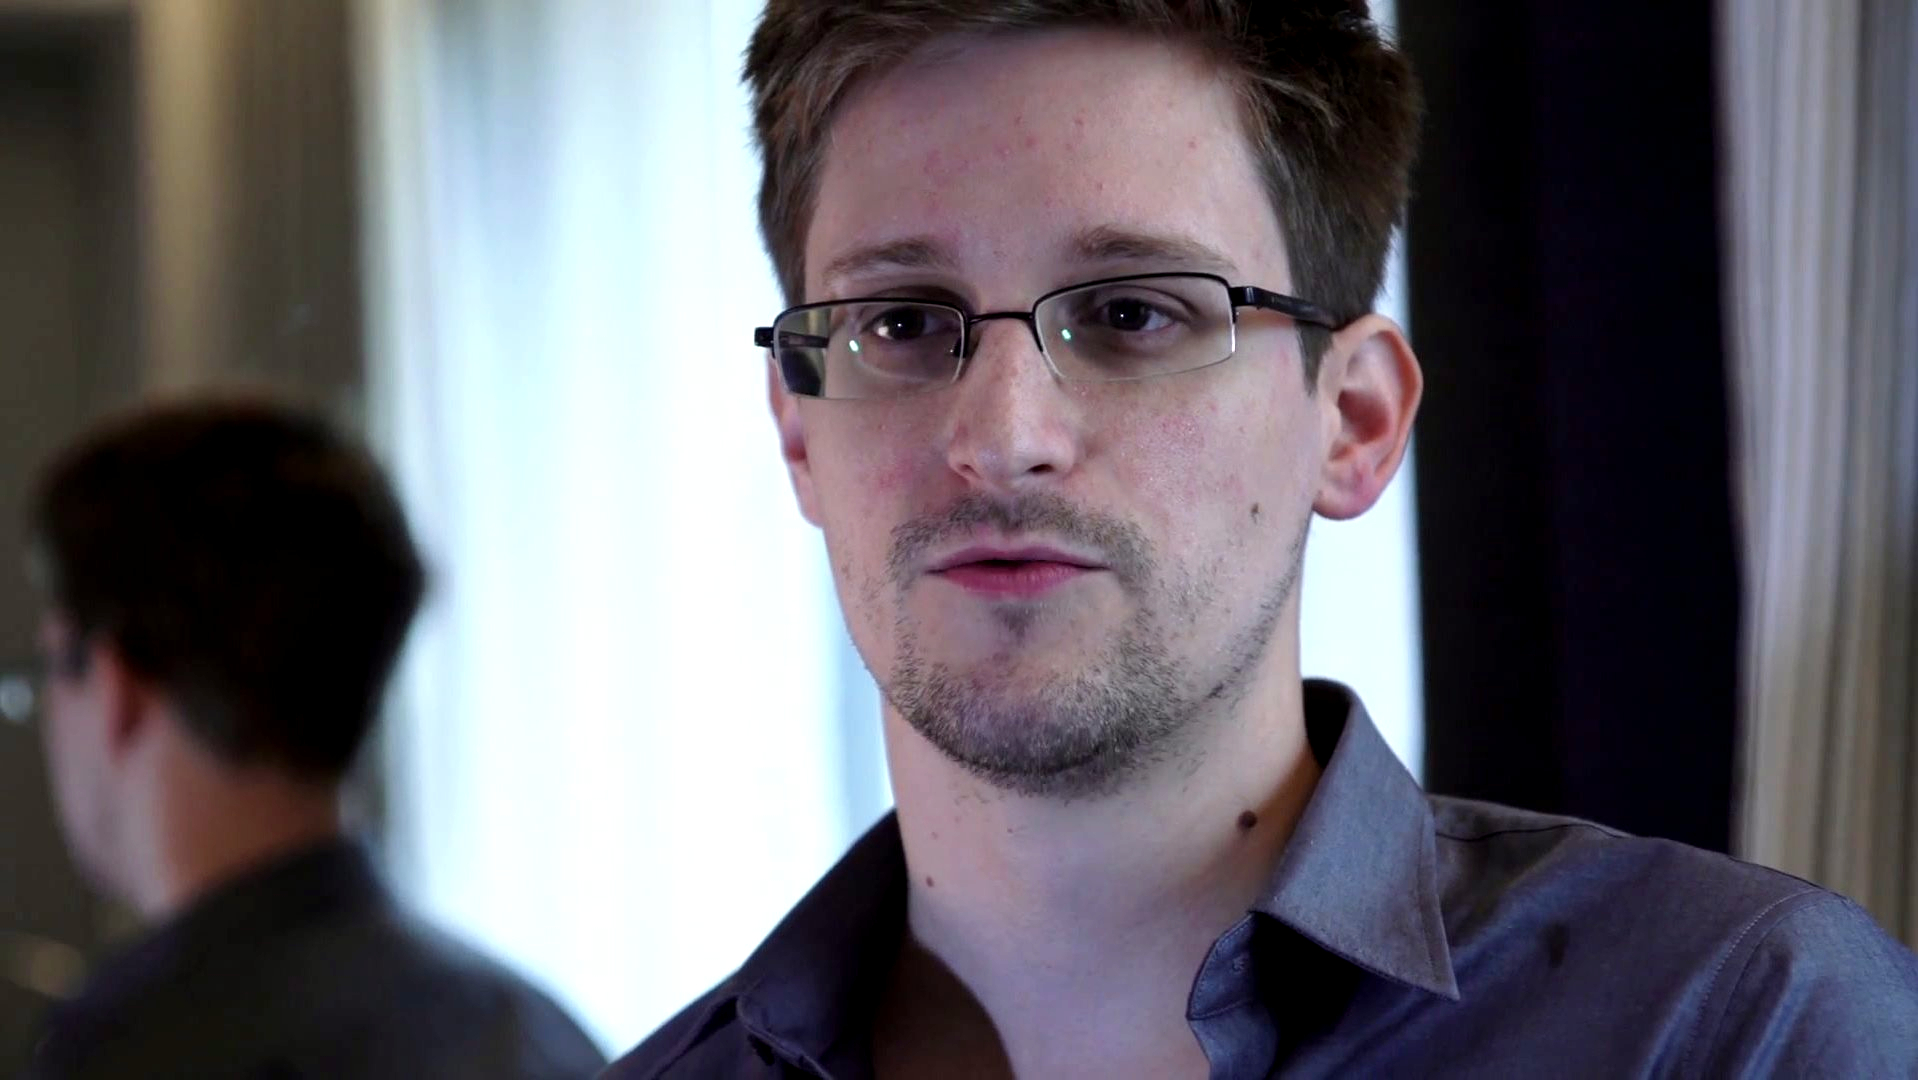 Edward Snowden, The Whistle-blower Attains Citizenship in Russia